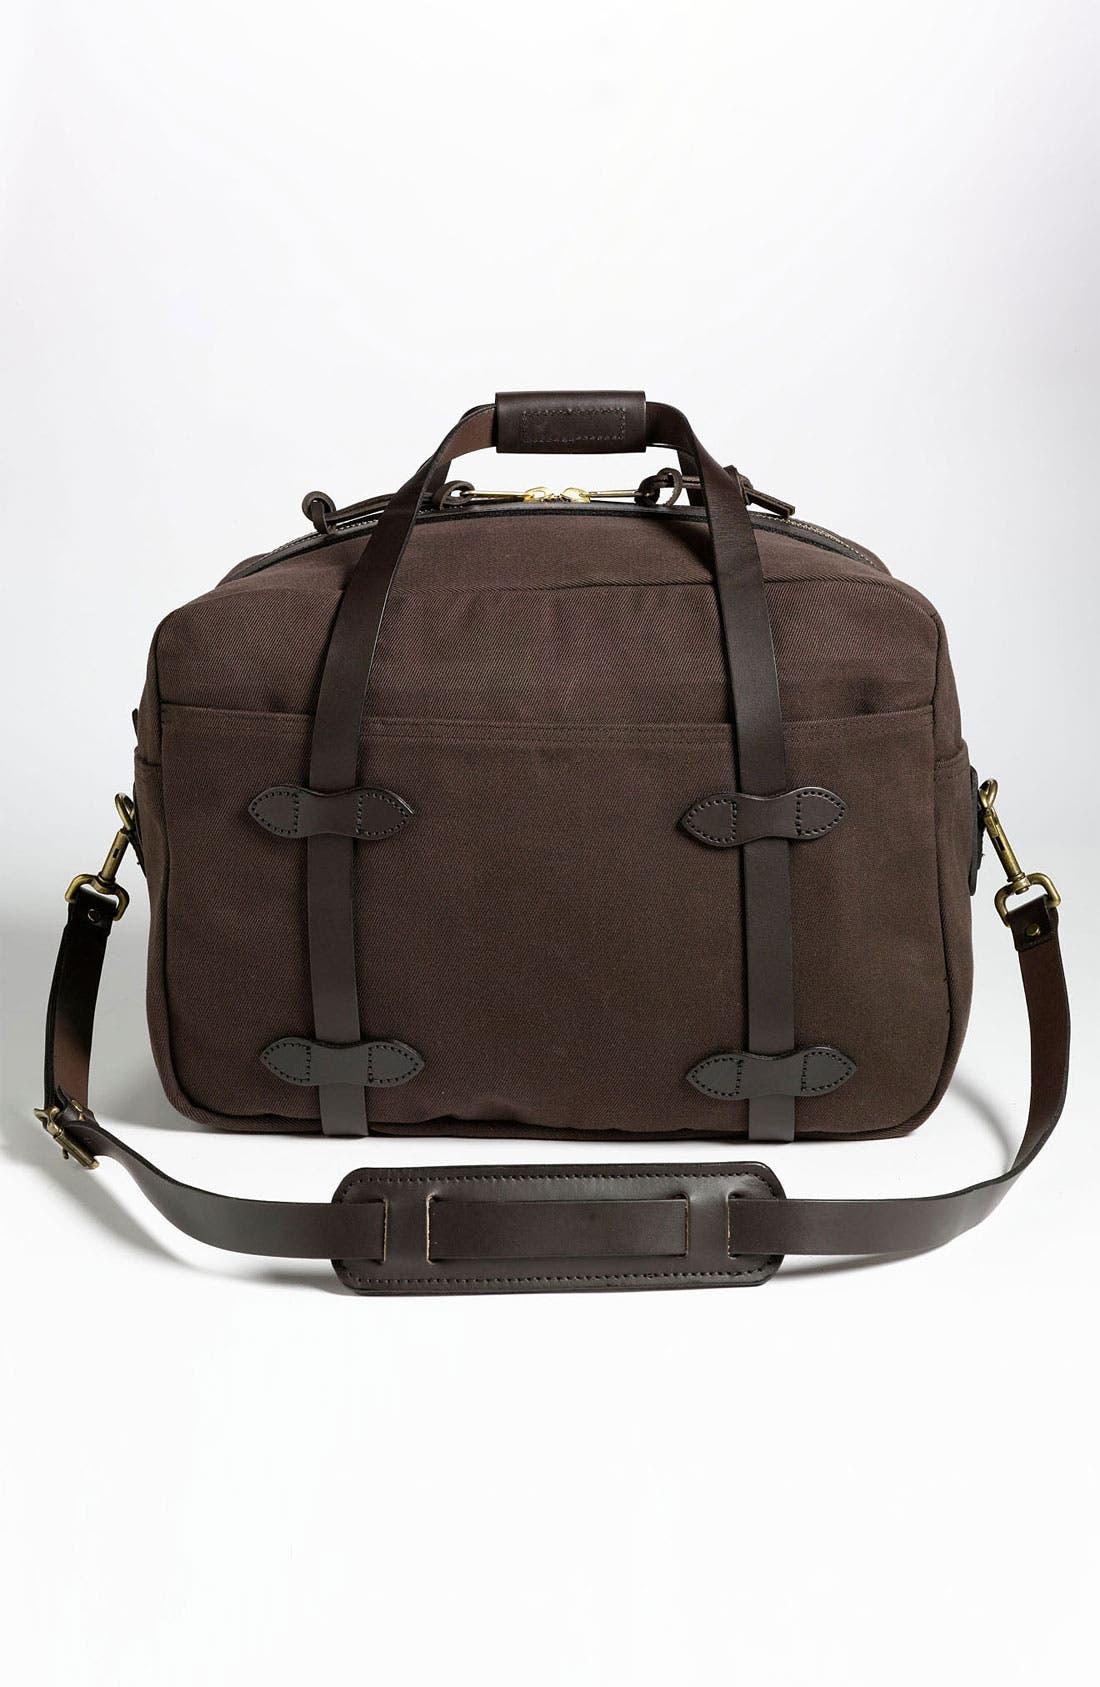 Medium Travel Bag,                             Alternate thumbnail 2, color,                             200